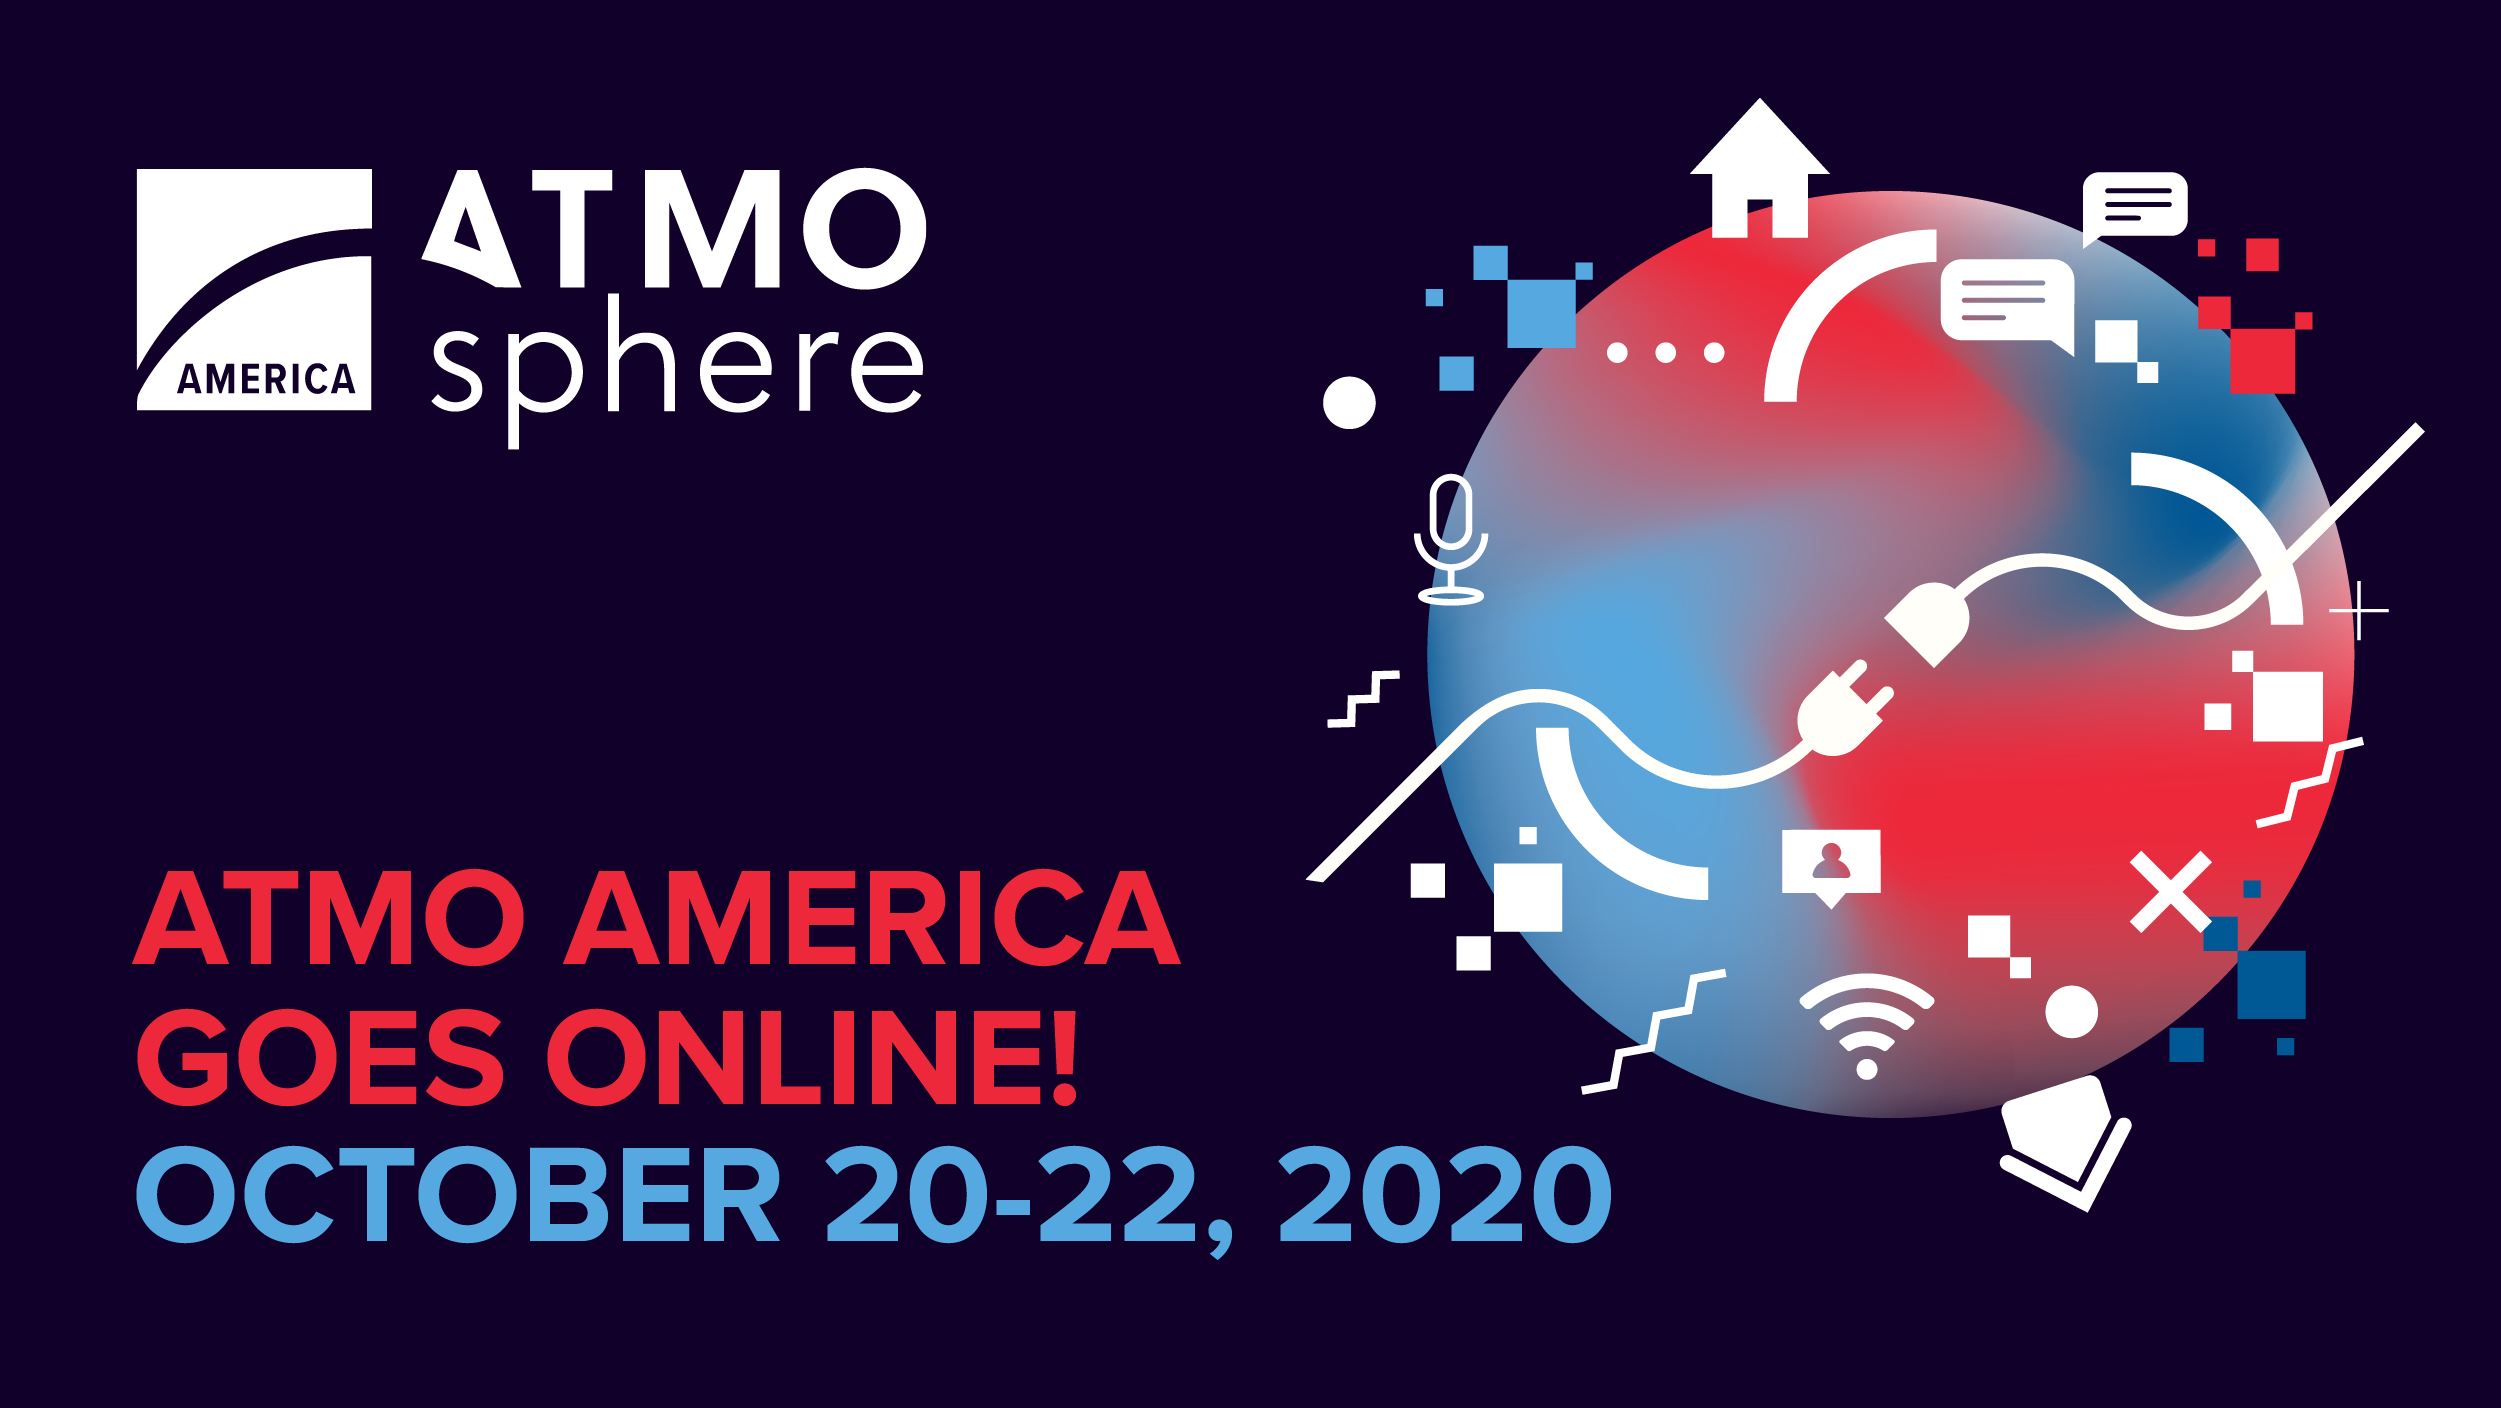 ATMO AMERICA 2020 GOES ONLINE